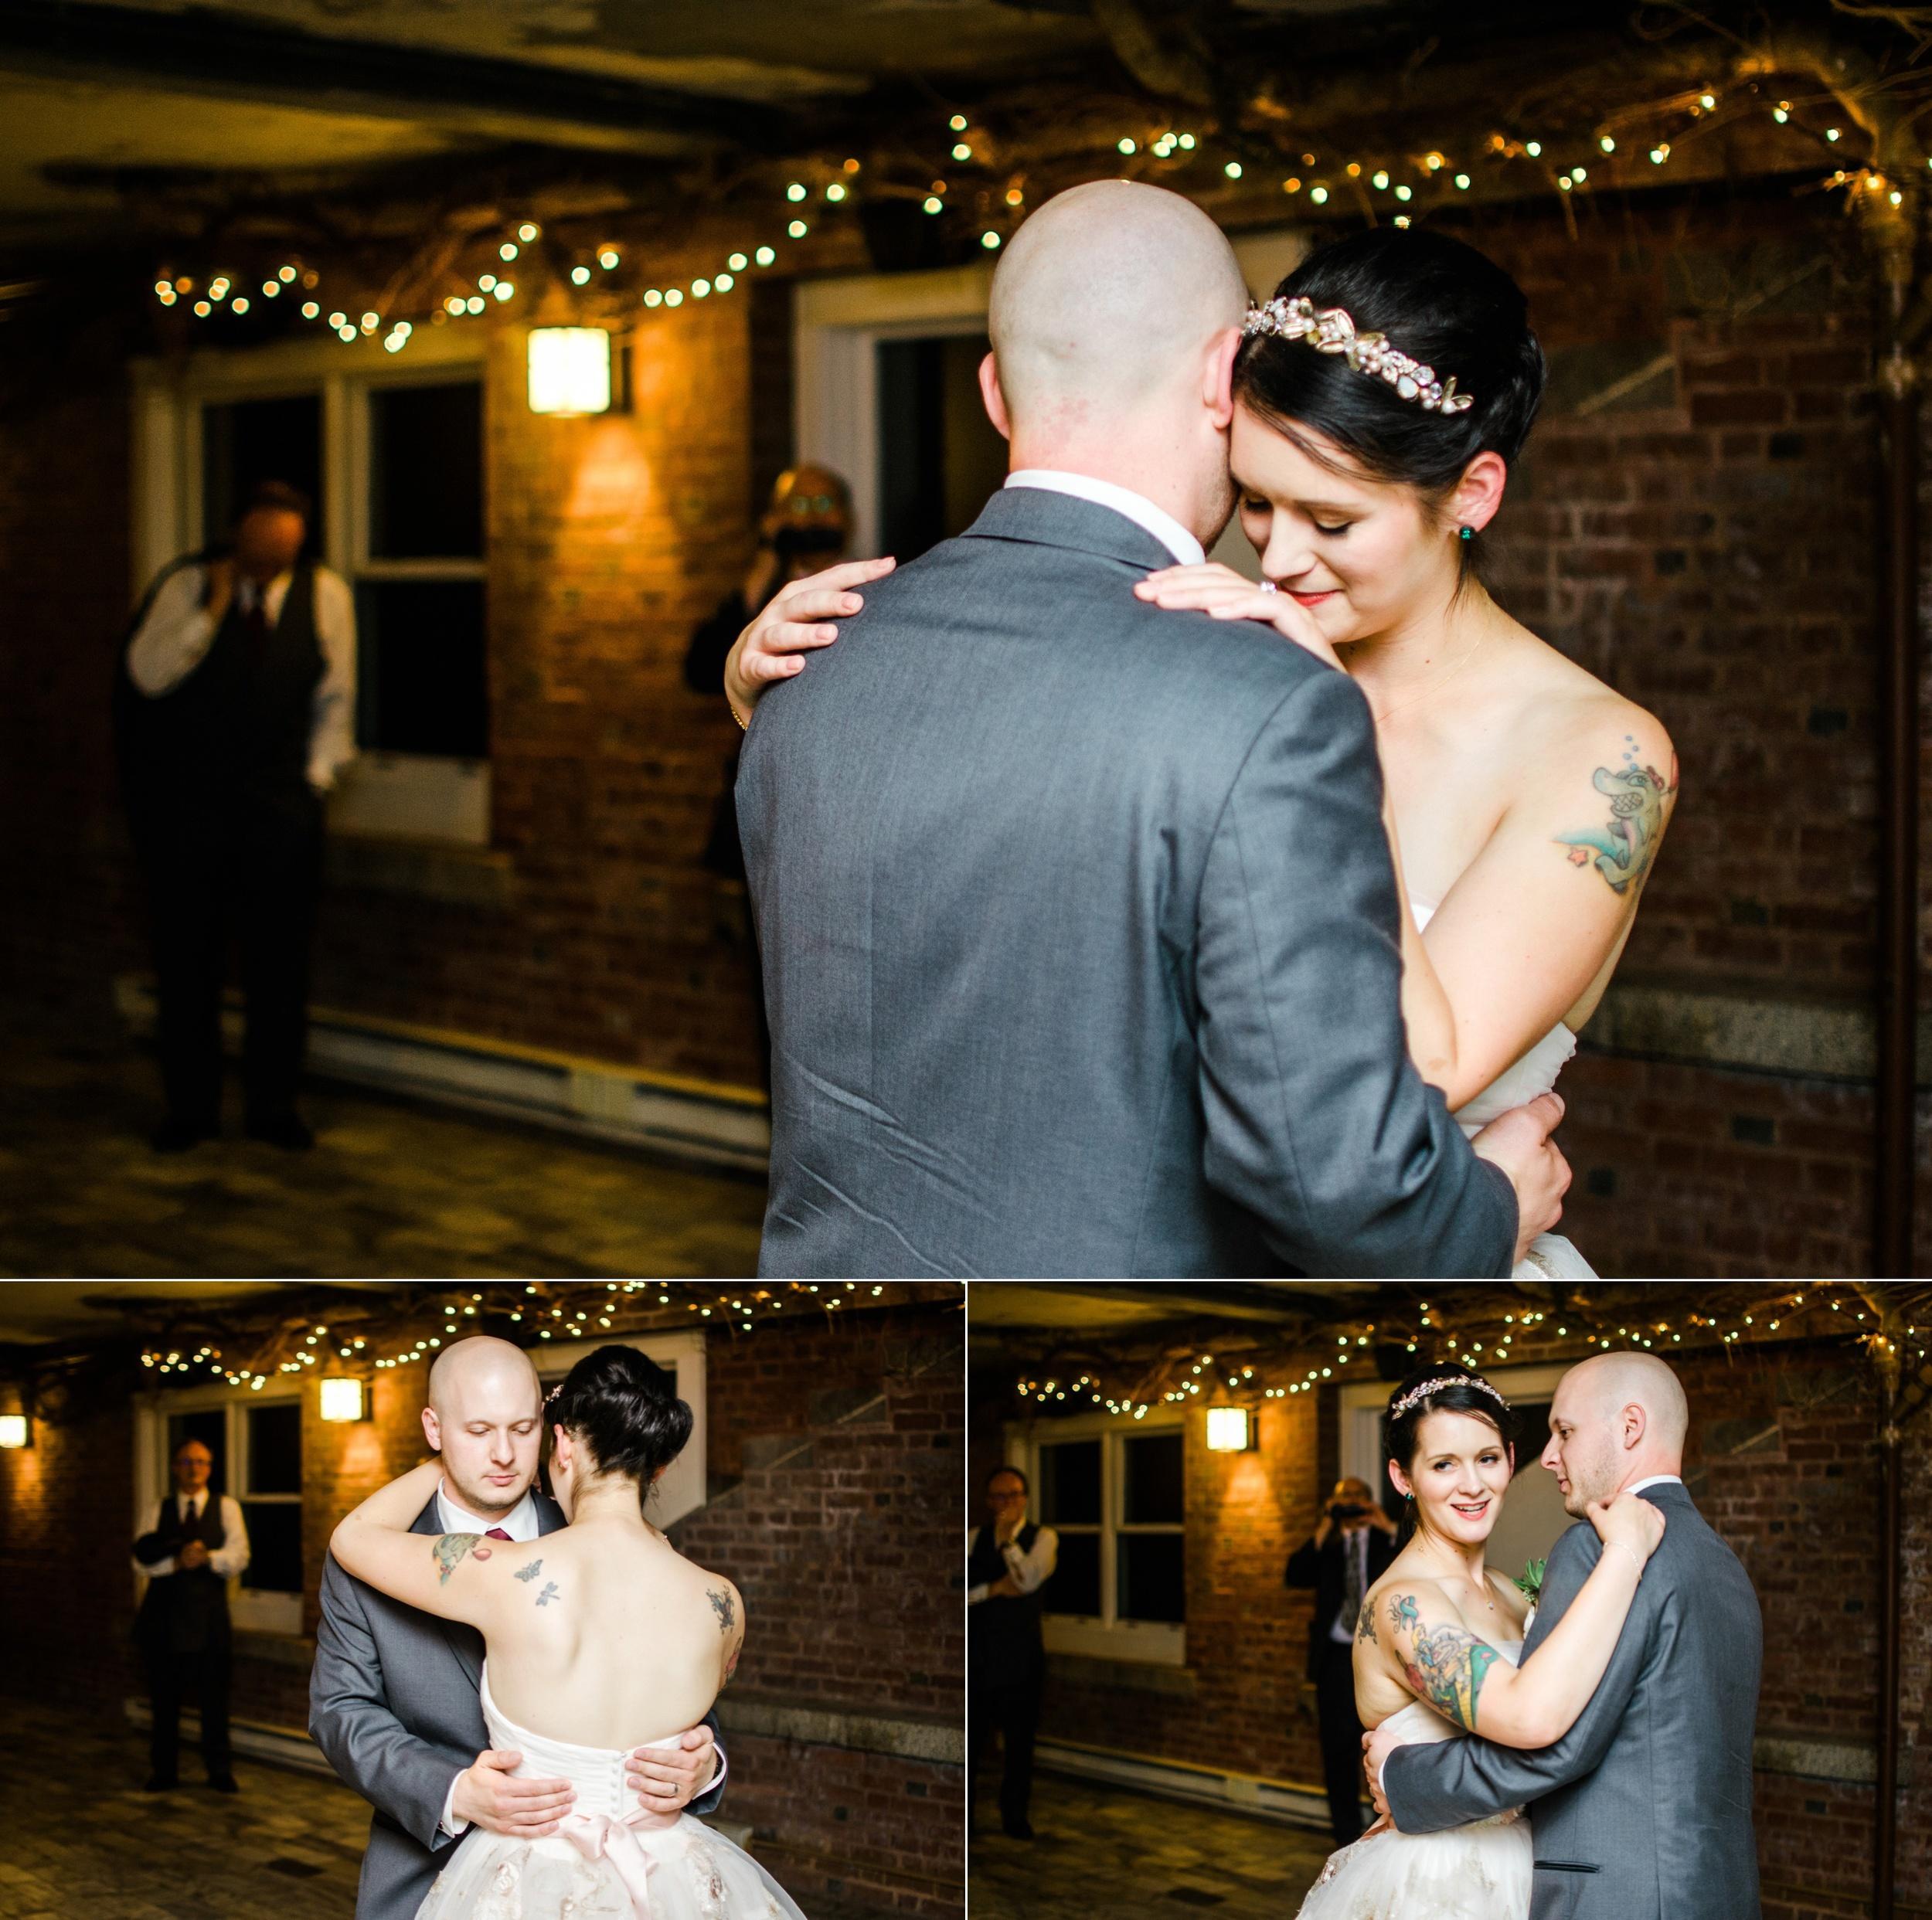 Glensheen Mansion Wedding | Duluth, MN Wedding Photographer_0524.jpg